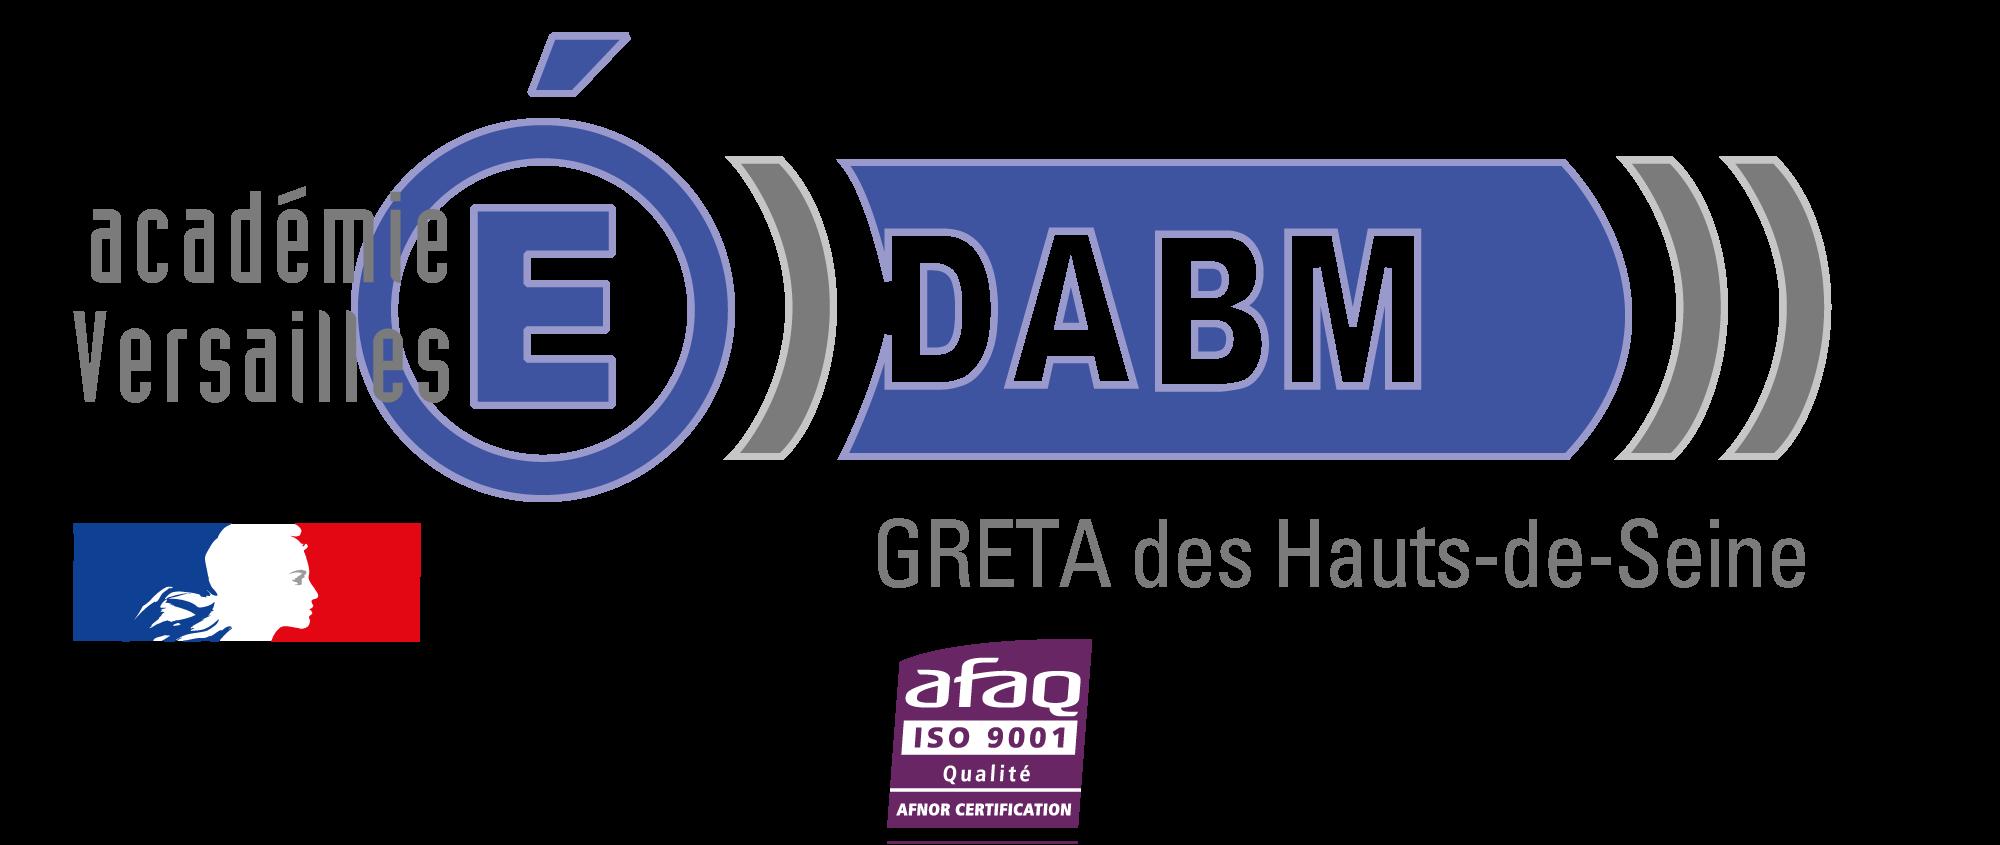 Centre DABM 92 - VAE Boulogne Billancourt